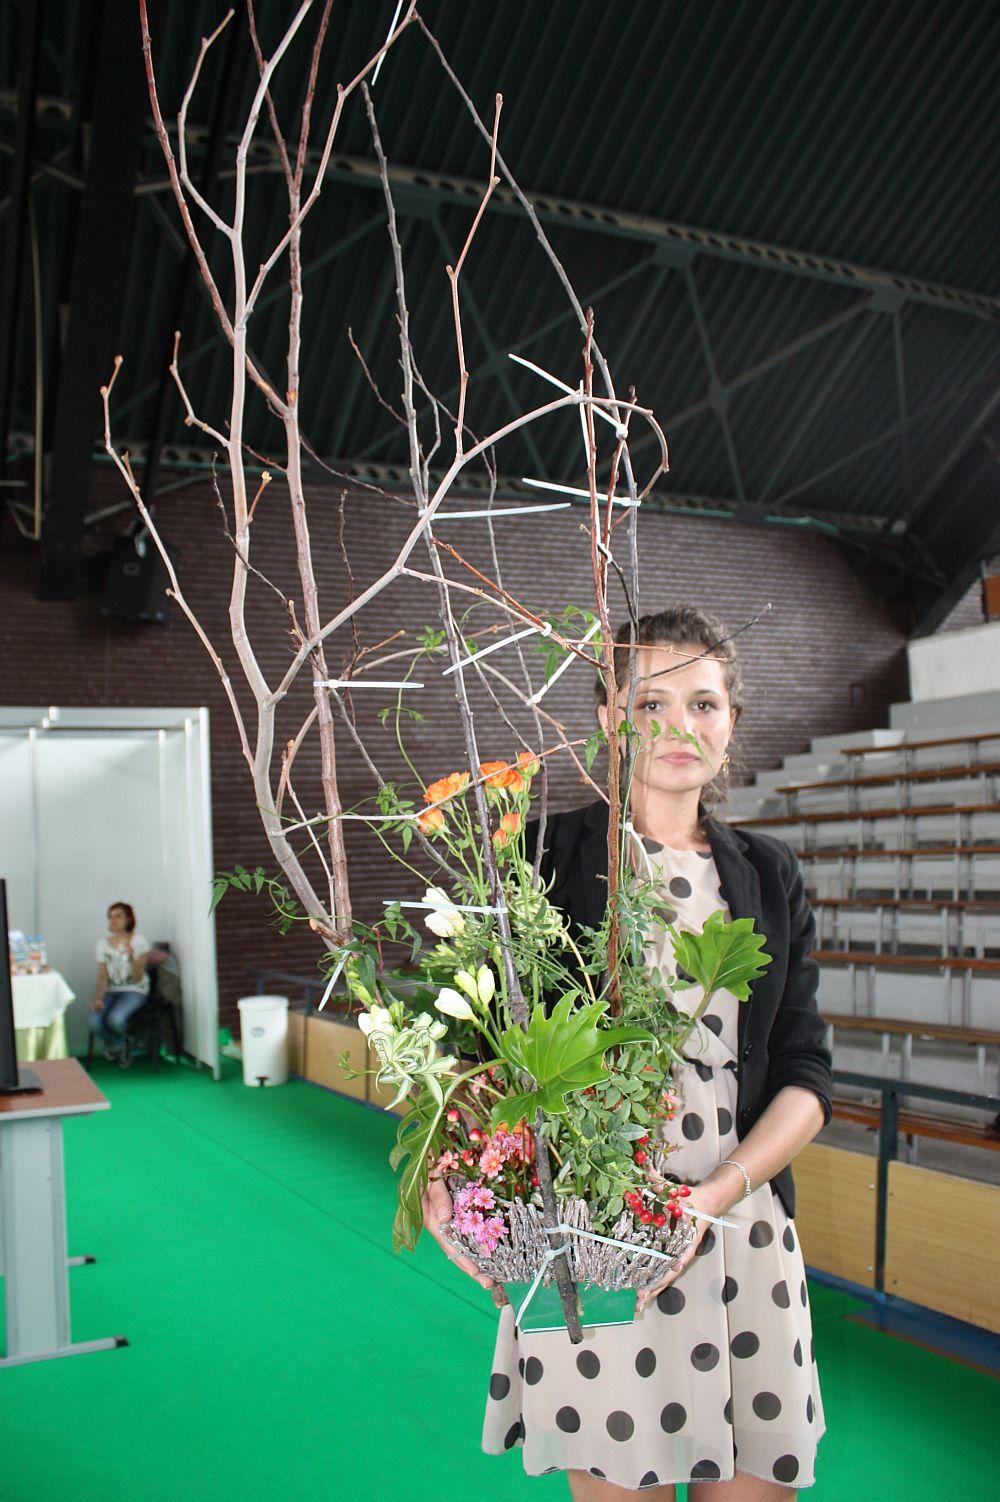 adelaparvu.com despre targul de plante, flori si peisagistica Hartus Florshow 2014 (4)